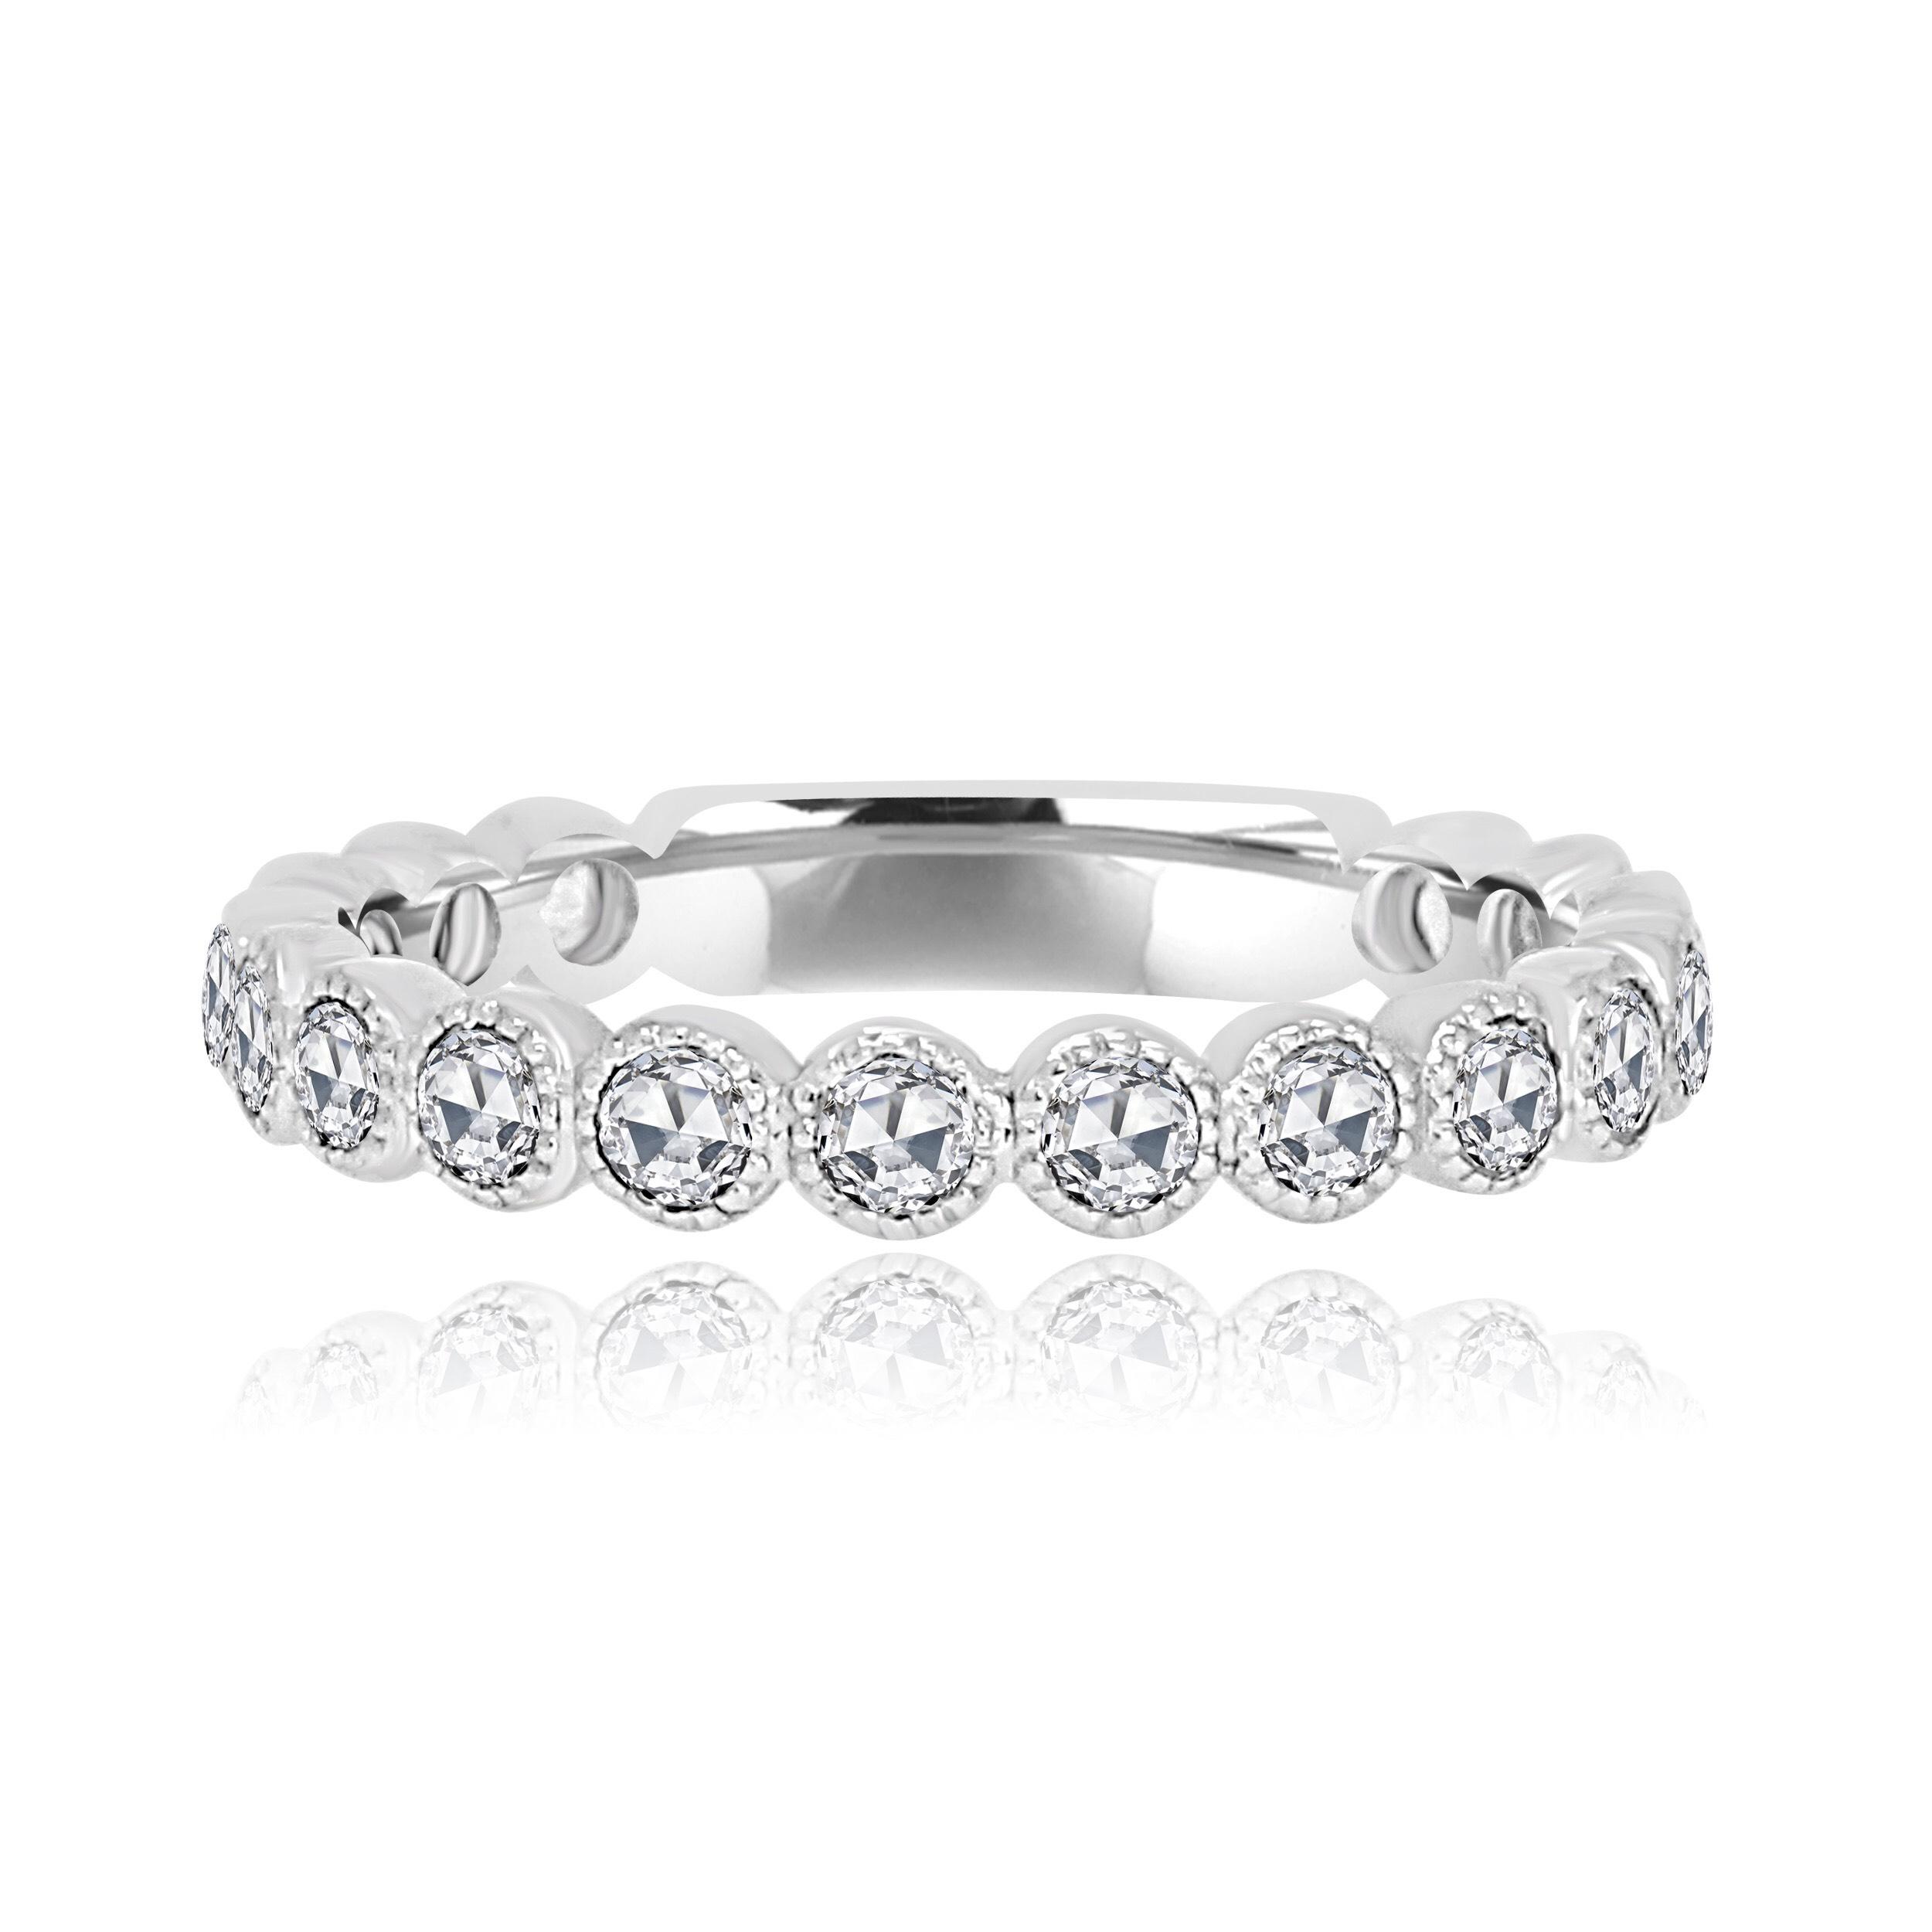 Rose Cut White Gold Diamond Stackable Ring.jpg